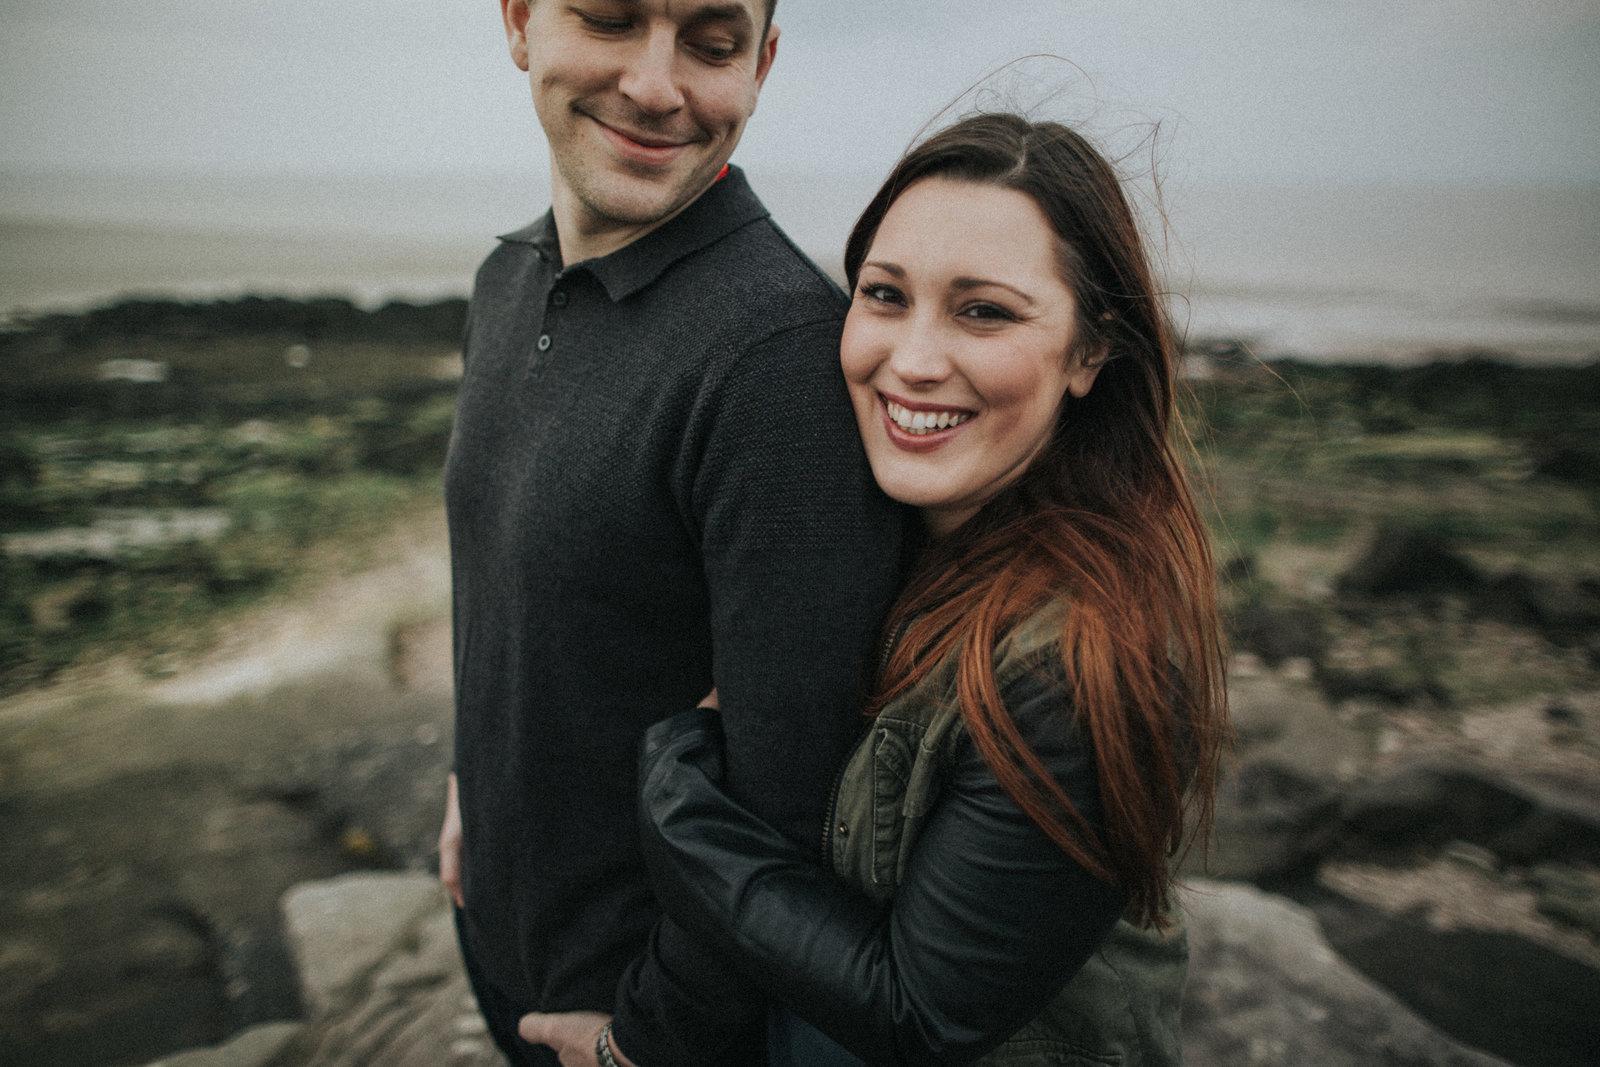 Engaged couple photographed in Morecambe Bay by Lancaster Wedding Photographer Jono Symonds